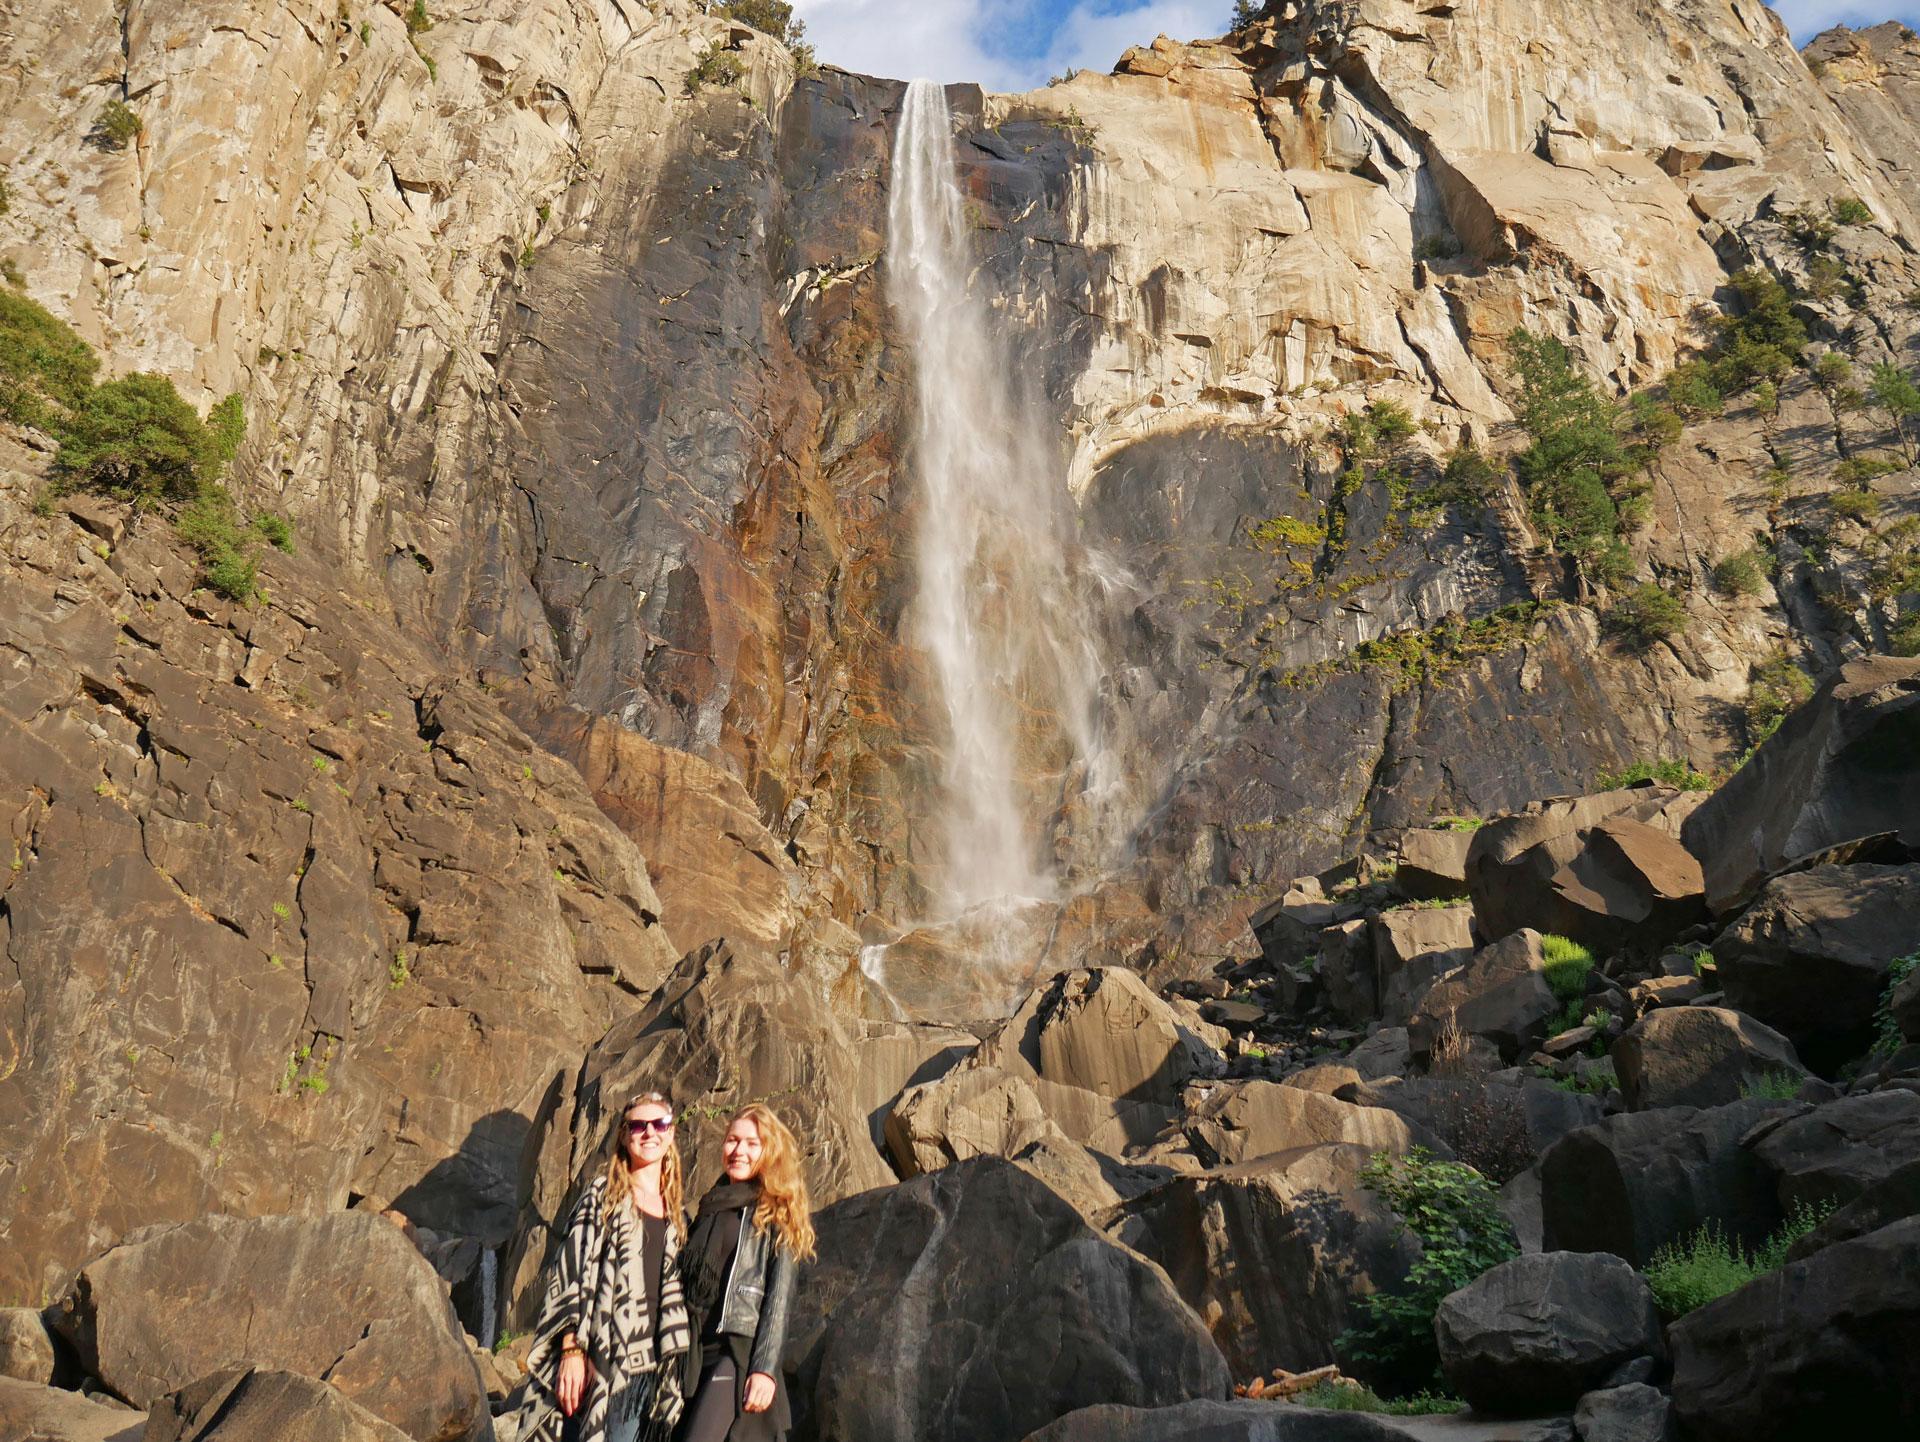 Sisters at Bridalveil Fall in Yosemite National Park